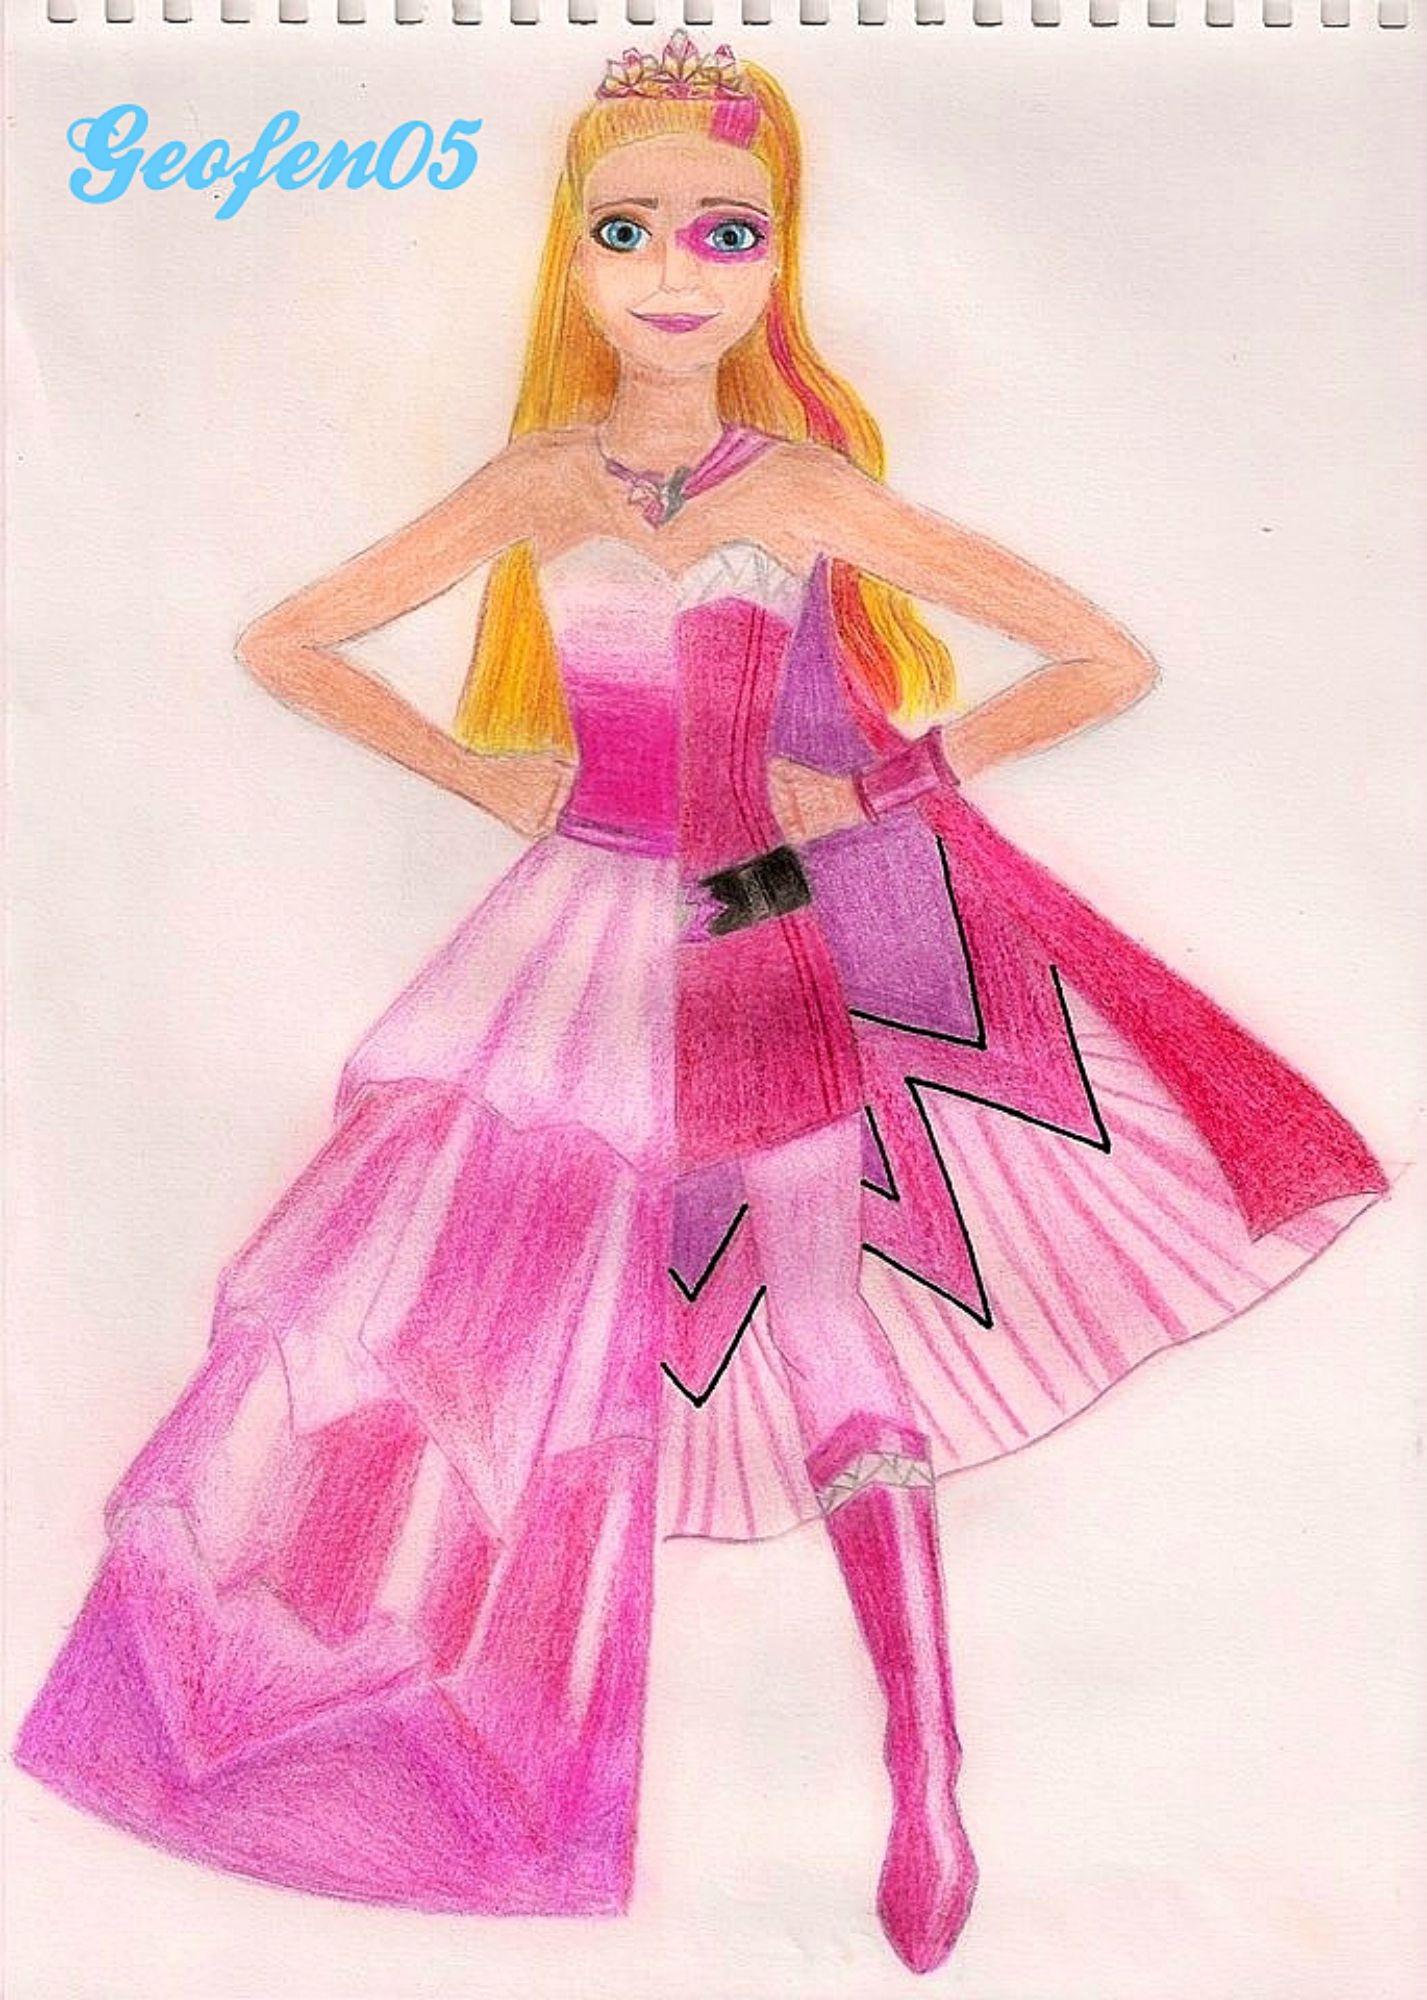 Barbie Filme Images Princess Kara HD Wallpaper And Background Photos